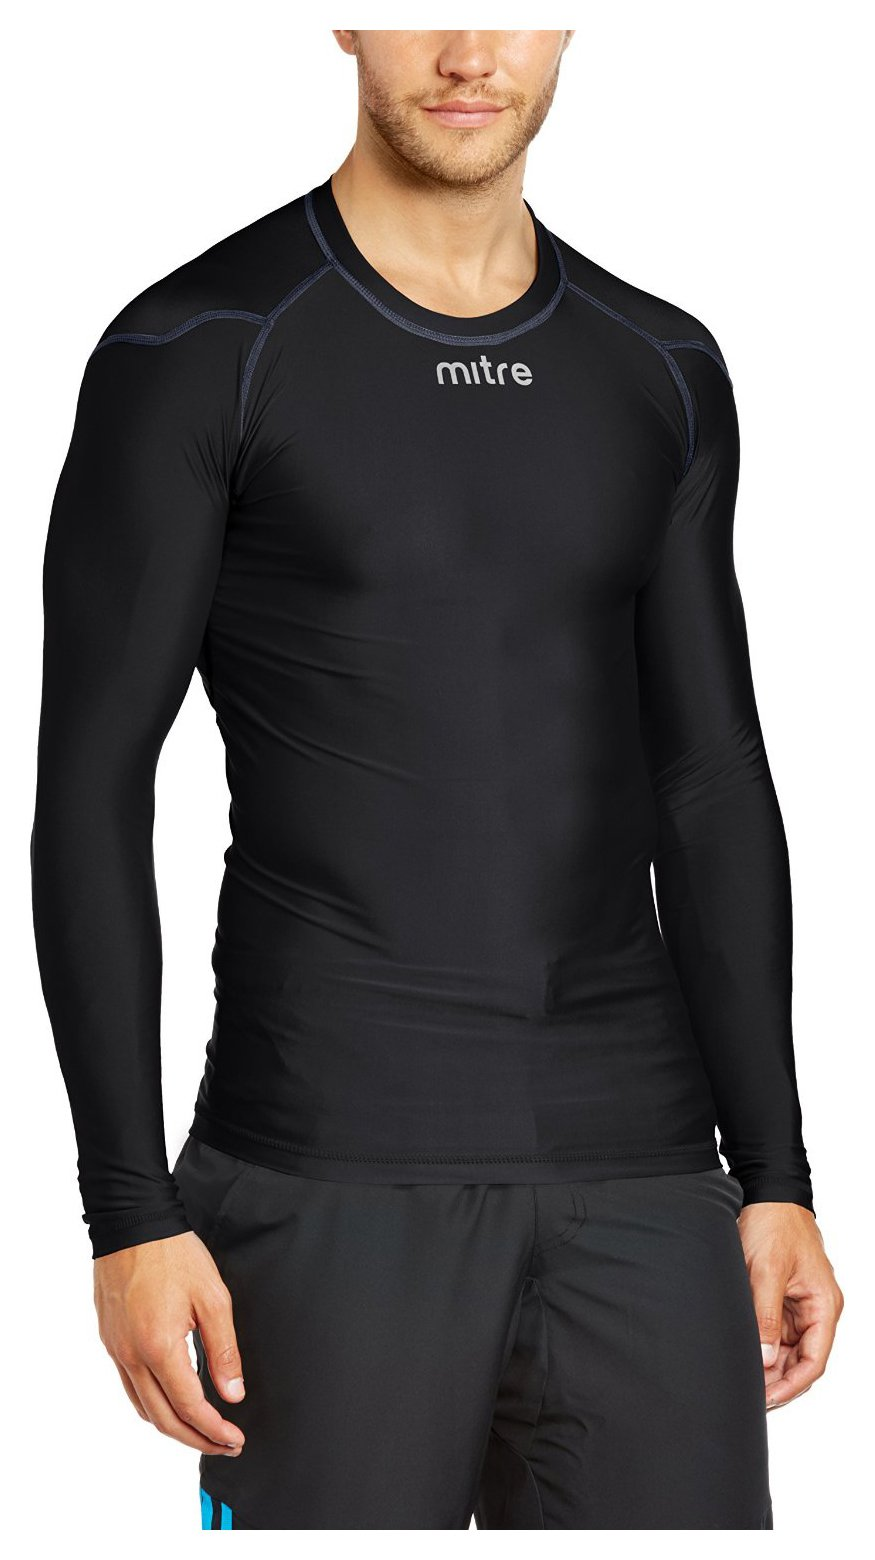 Image of Mitre - Base Layer Jersey Black - XS